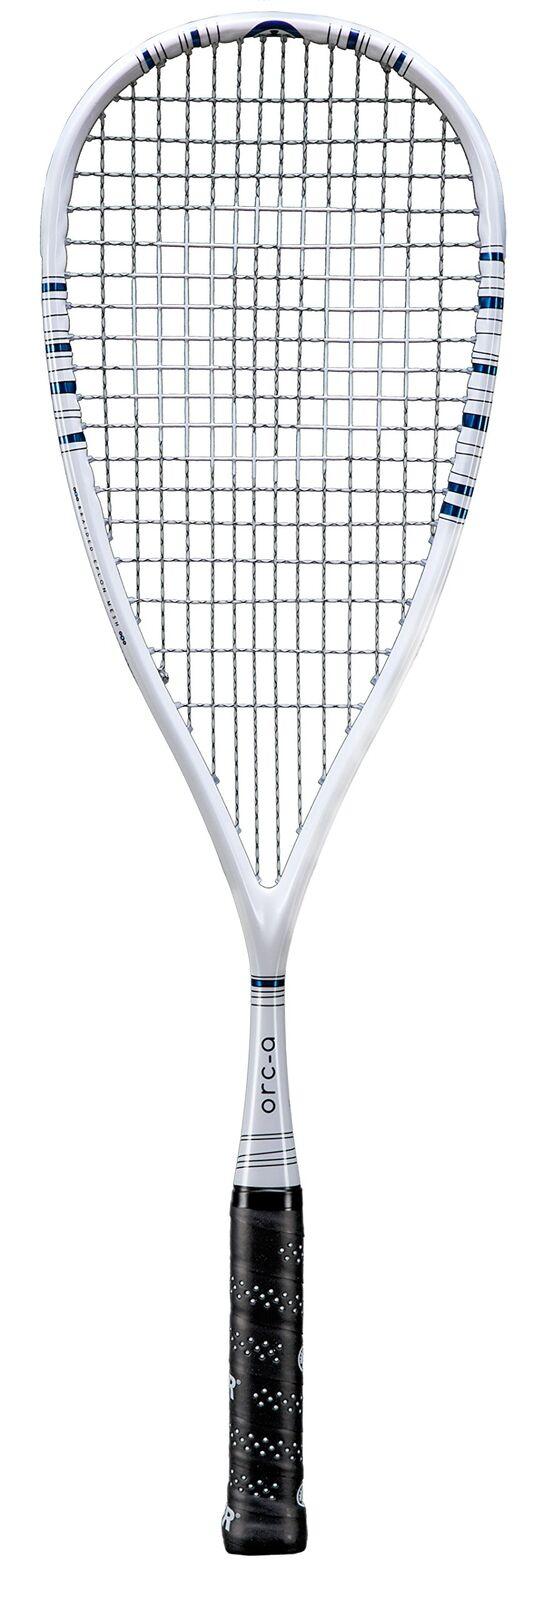 Oliver Squash Racket ORC-A III Squashracket RRP. RRP. RRP. 149,95 (Z2O) 7b3f9e